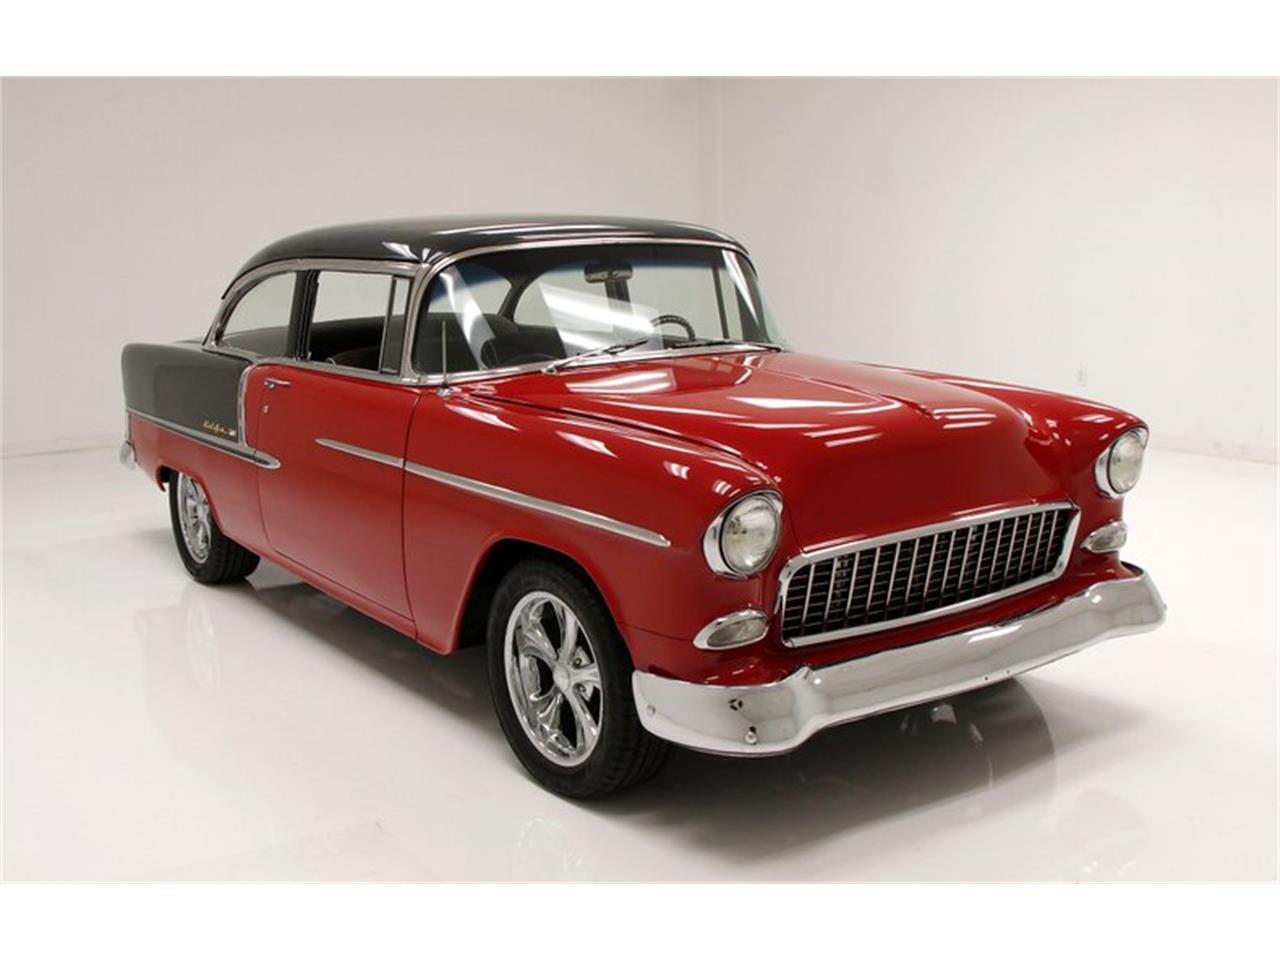 1955 Chevrolet Bel Air (CC-1335993) for sale in Morgantown, Pennsylvania